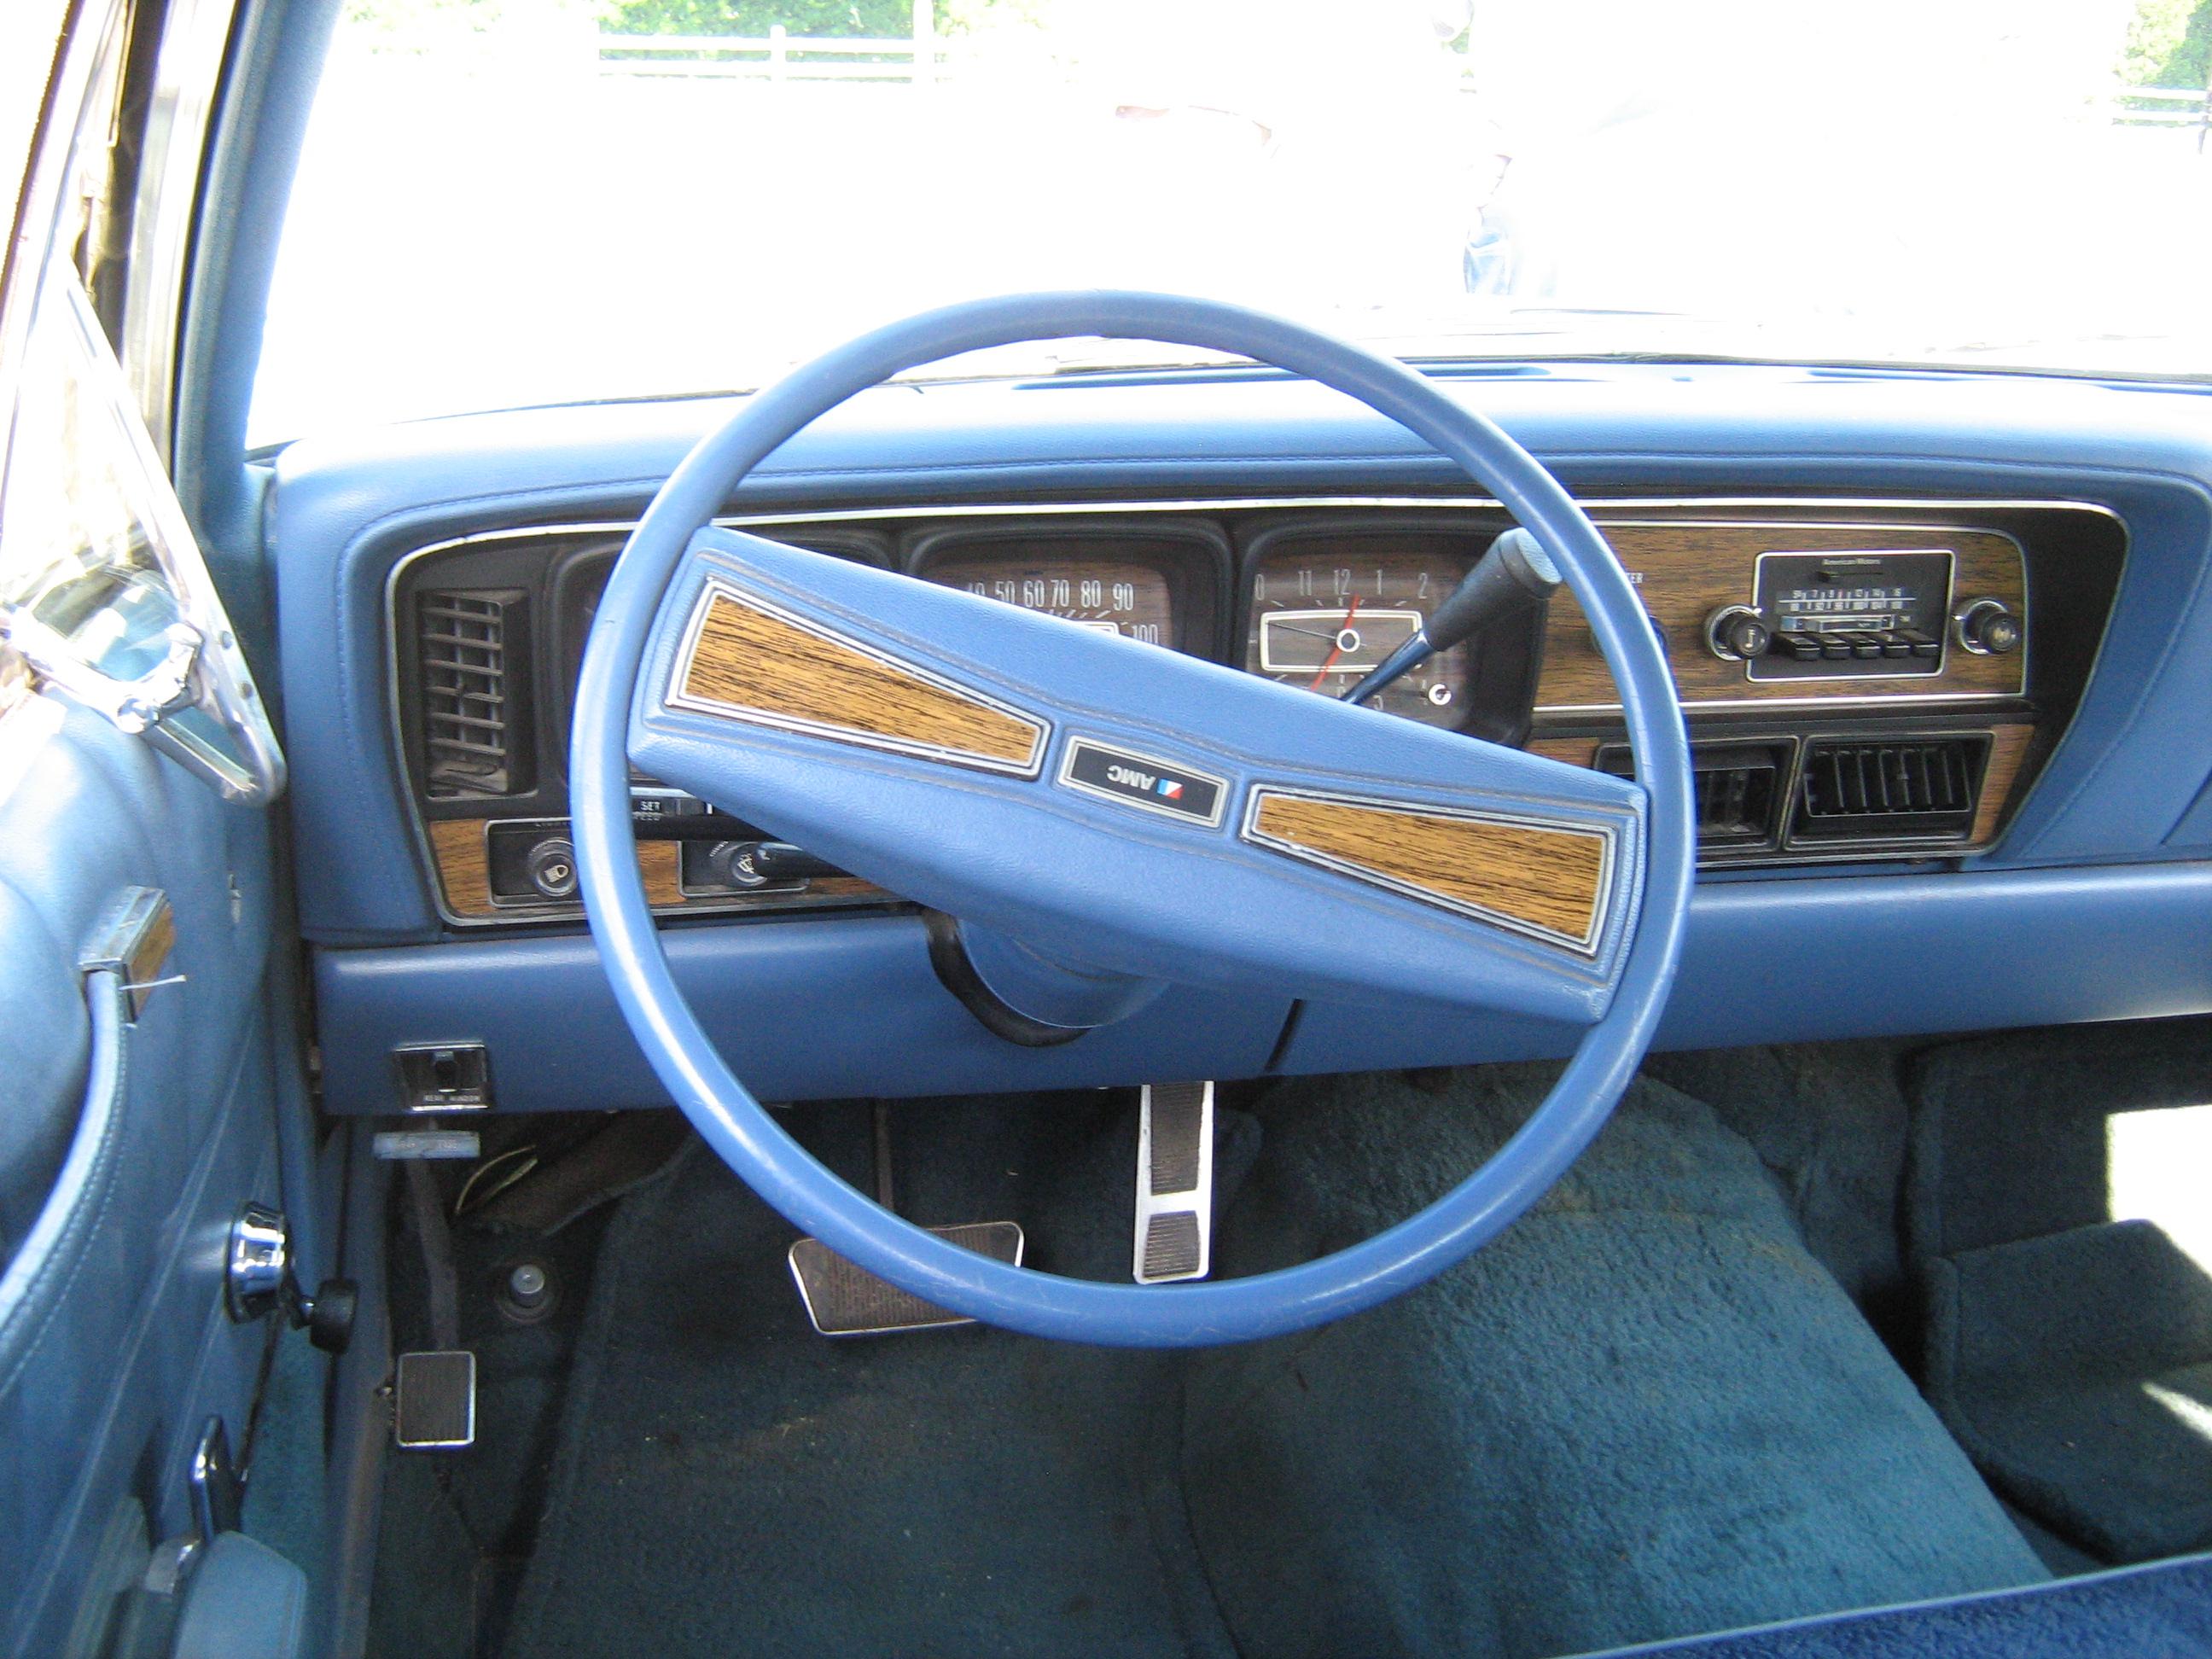 file 1974 amc ambassador sedan blue white kenosha wikimedia commons. Black Bedroom Furniture Sets. Home Design Ideas